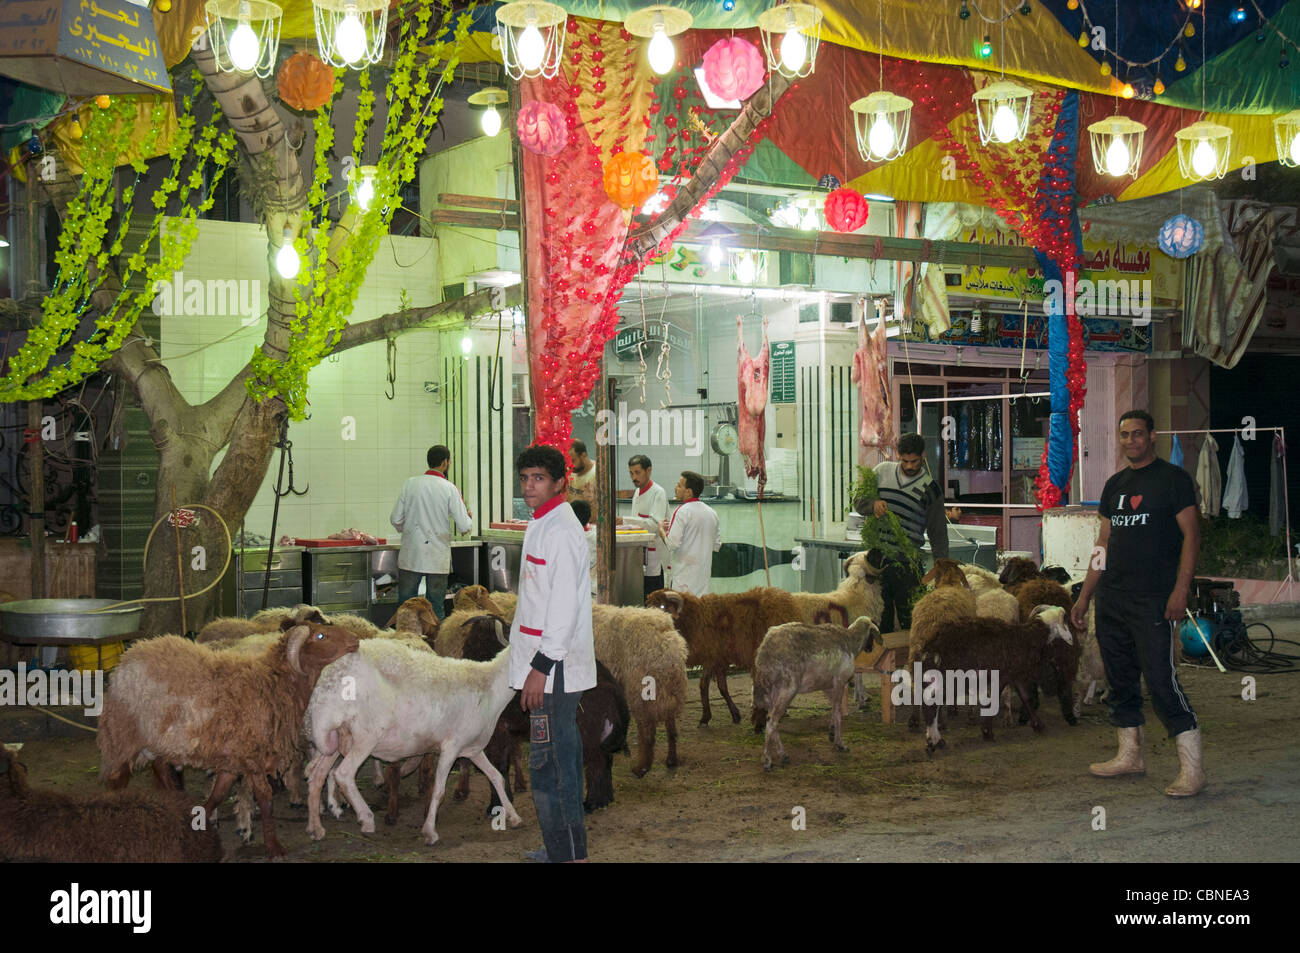 Sheep await their fate ahead of Eid el Adha, the Islamic Feast of Sacrifice, in Cairo - Stock Image